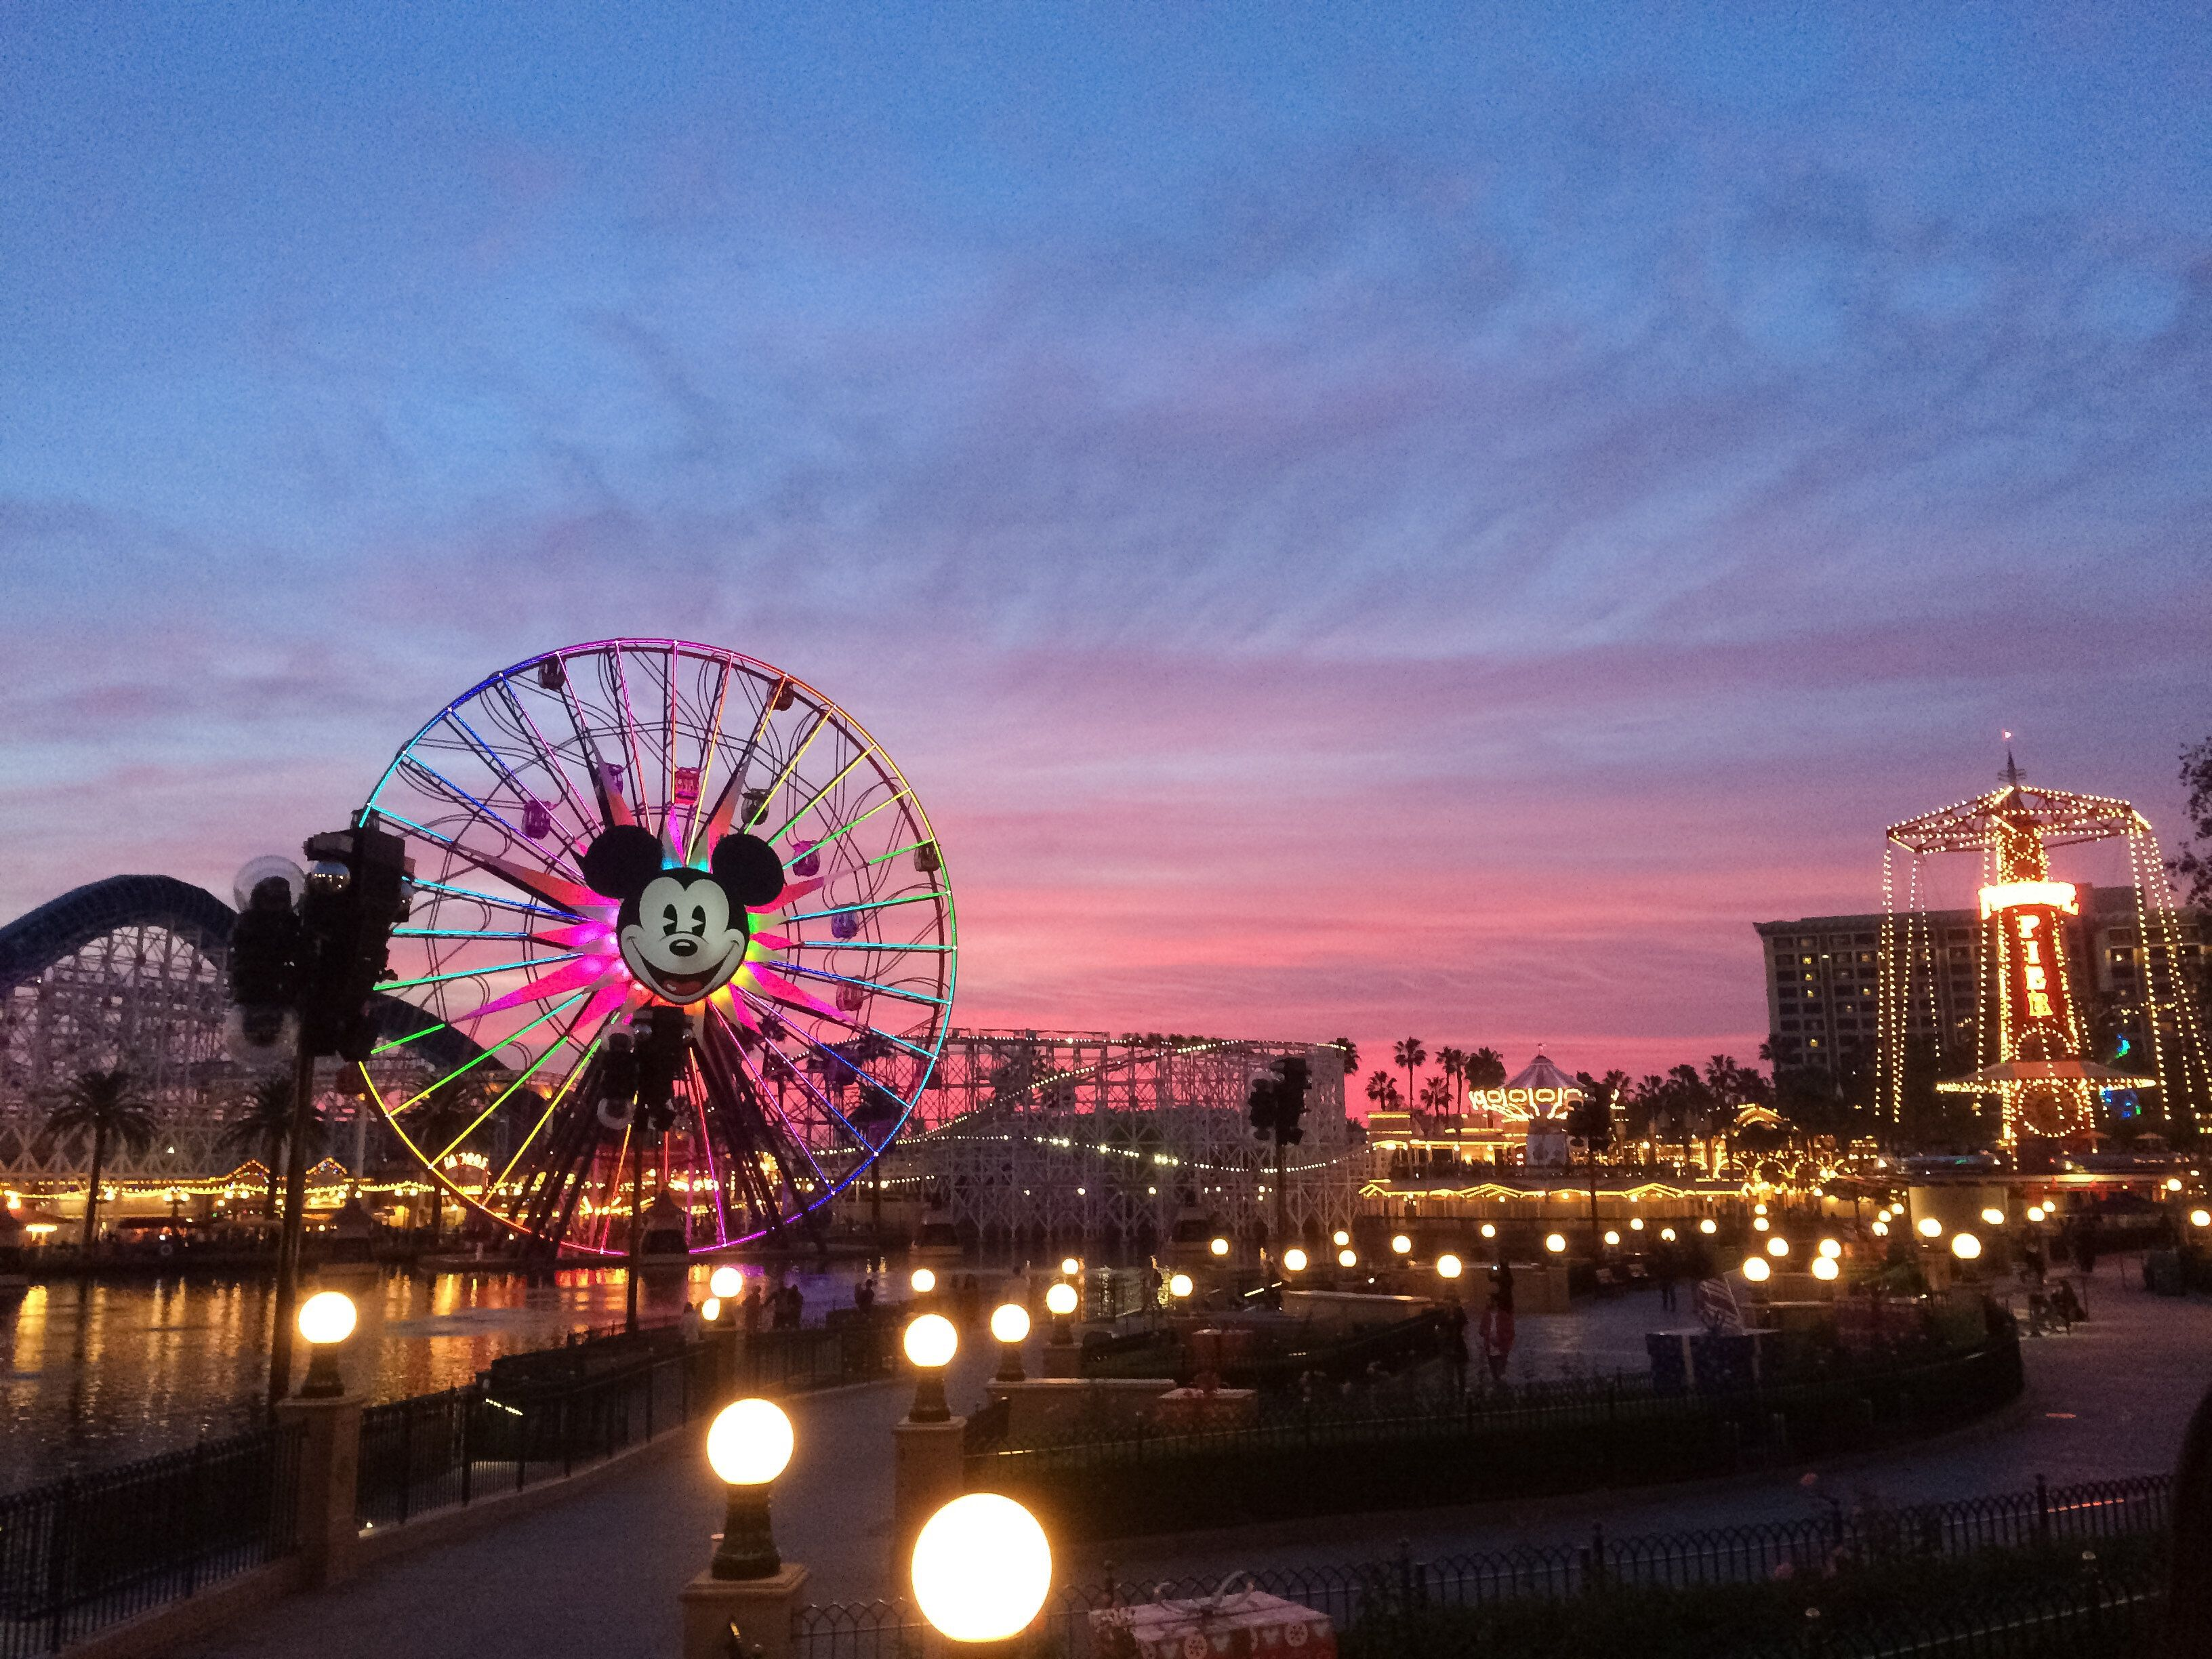 Tourists wander around Disney's California Adventure located adjacent to Disneyland, a major tourist attraction in Anaheim. T